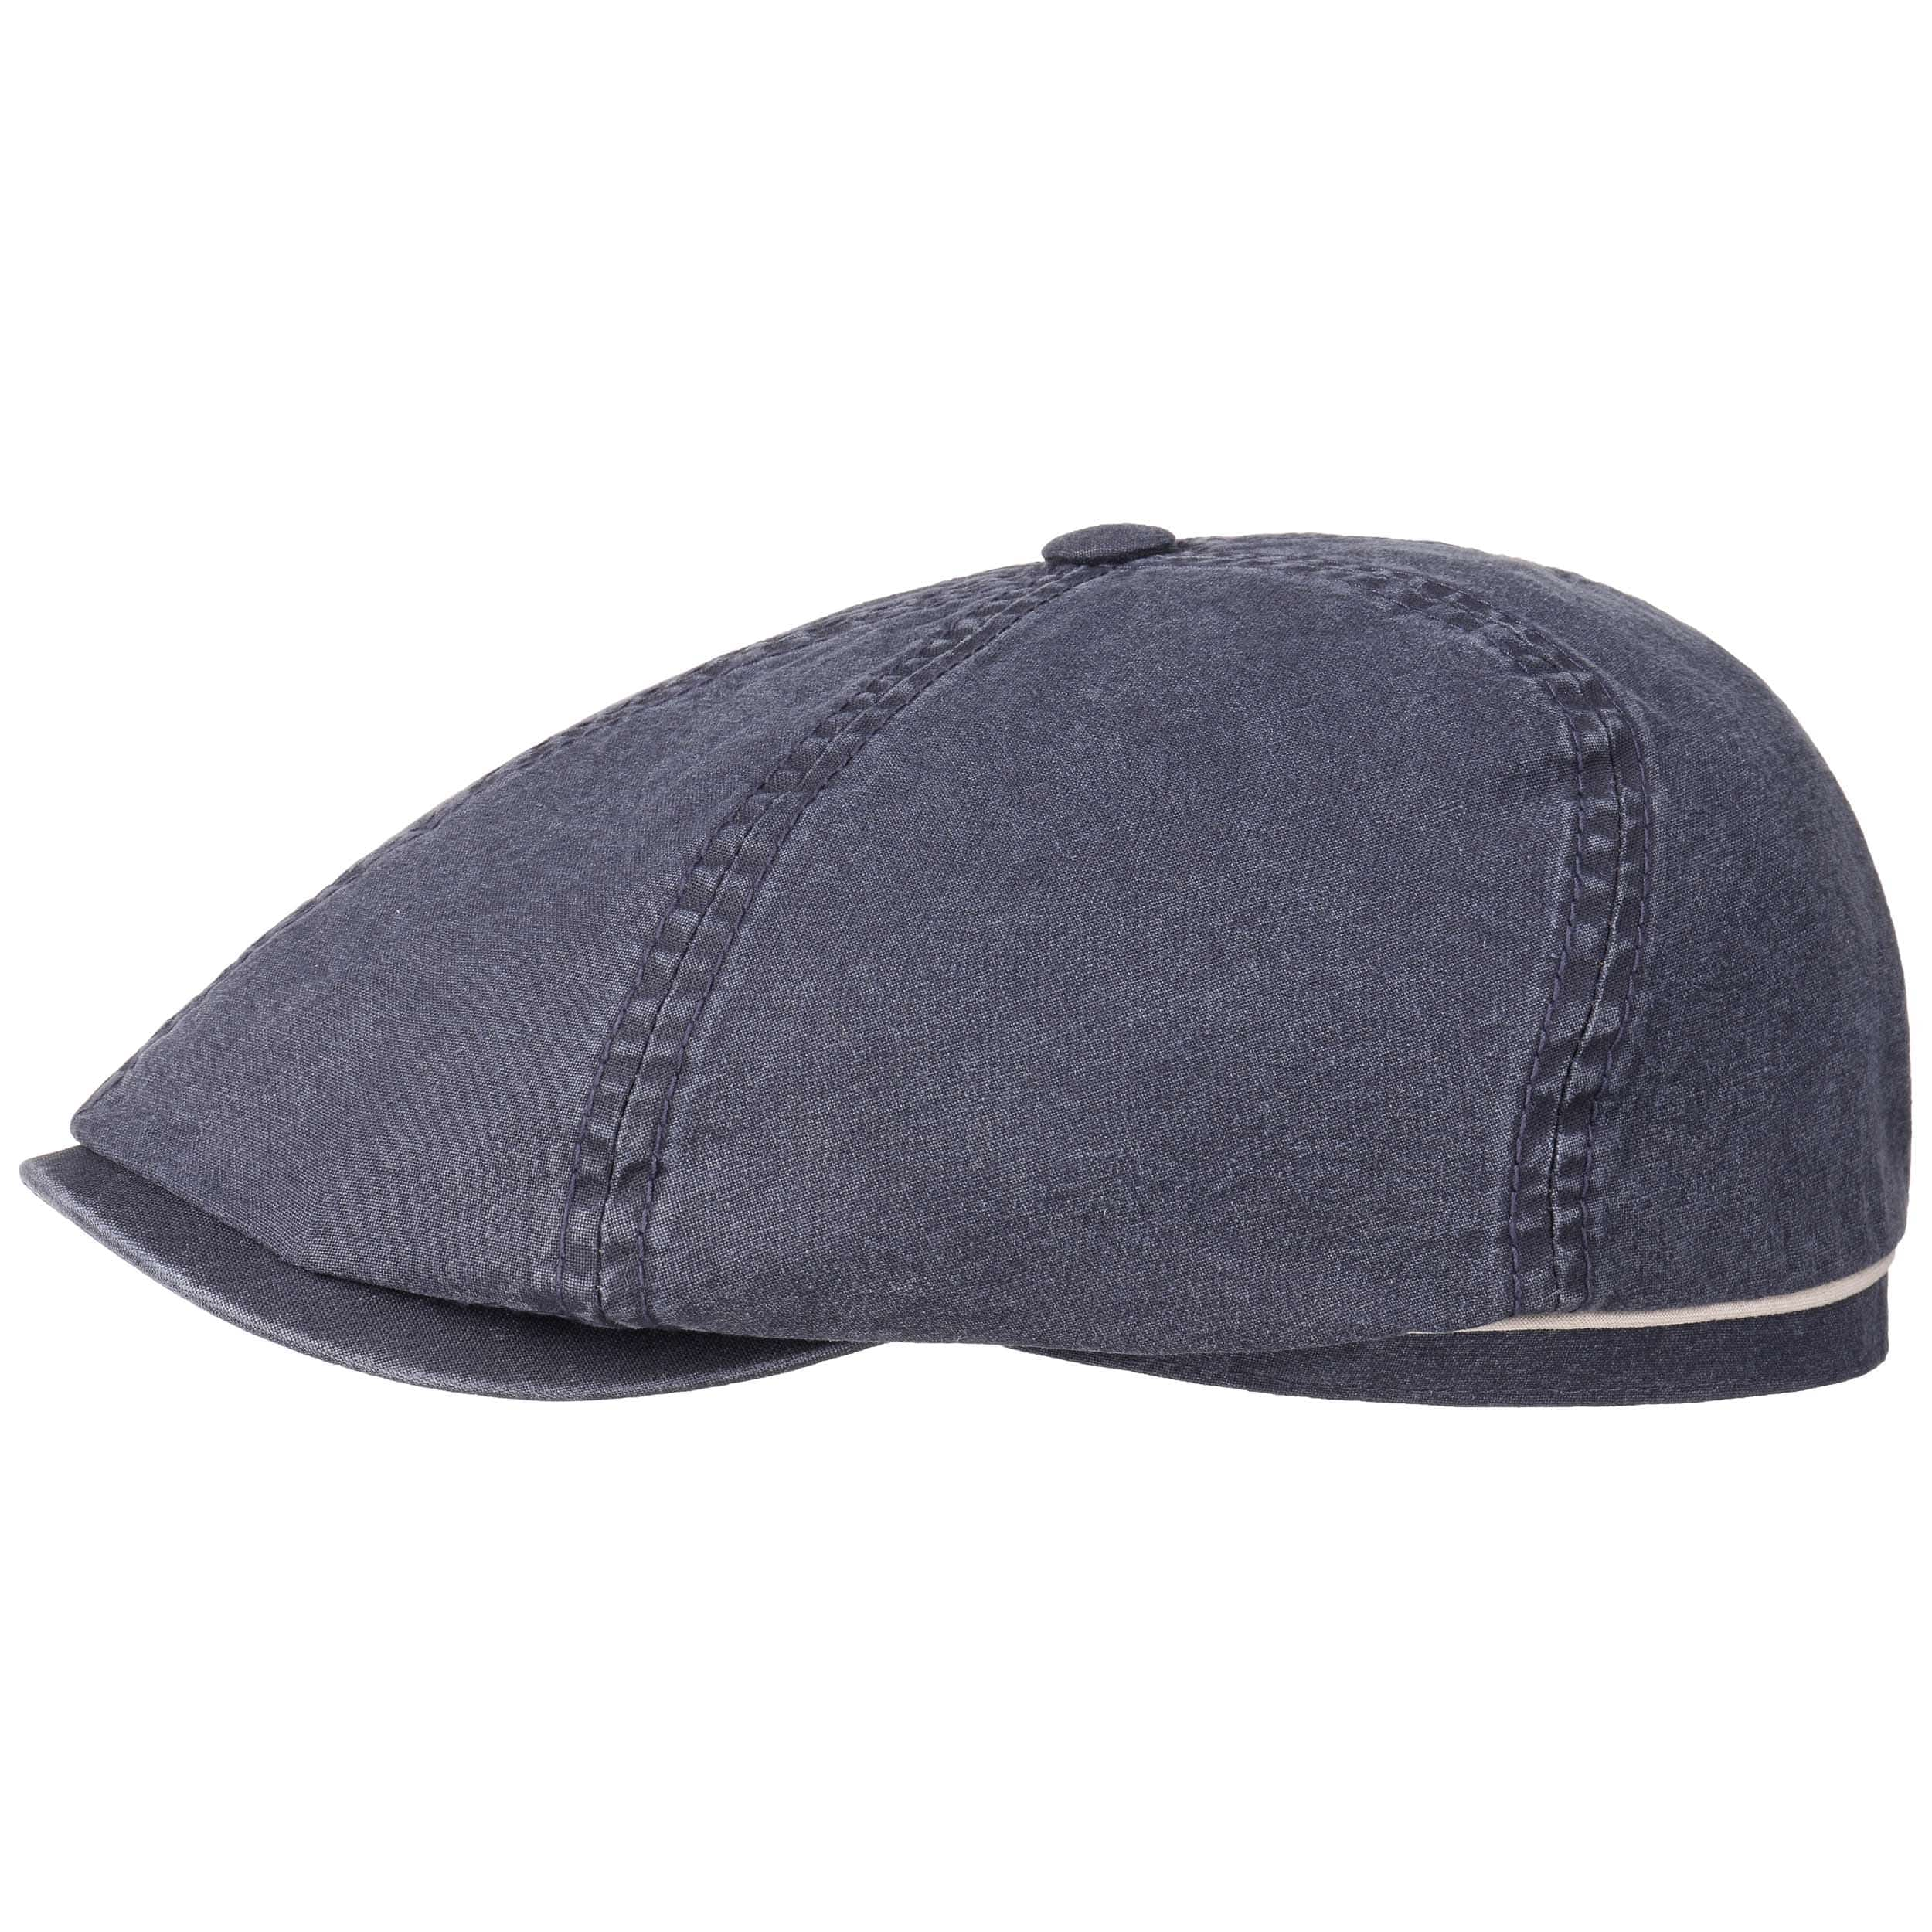 Delave Organic Cotton Flat Cap by Stetson 869388b3f11